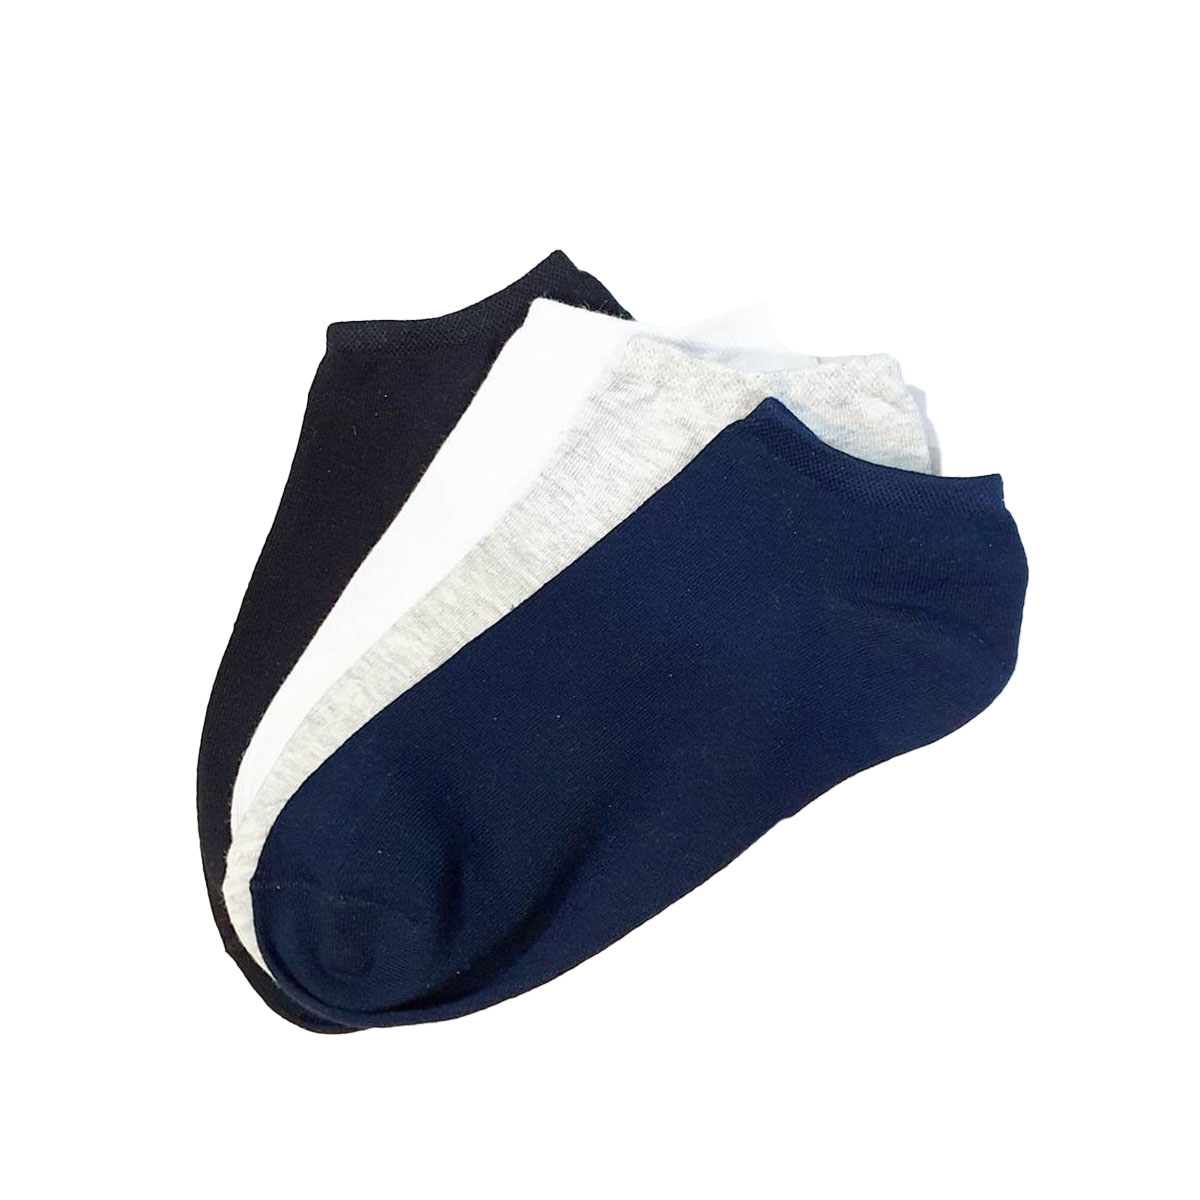 Pack of 5 pairs| Cotton ankle socks for men women| multi-colors| Low cut socks| Short socks